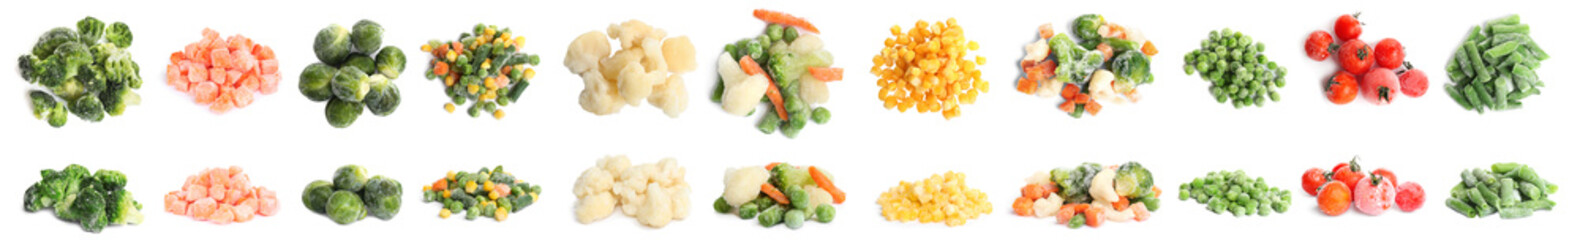 Set of different frozen vegetables on white background. Banner design